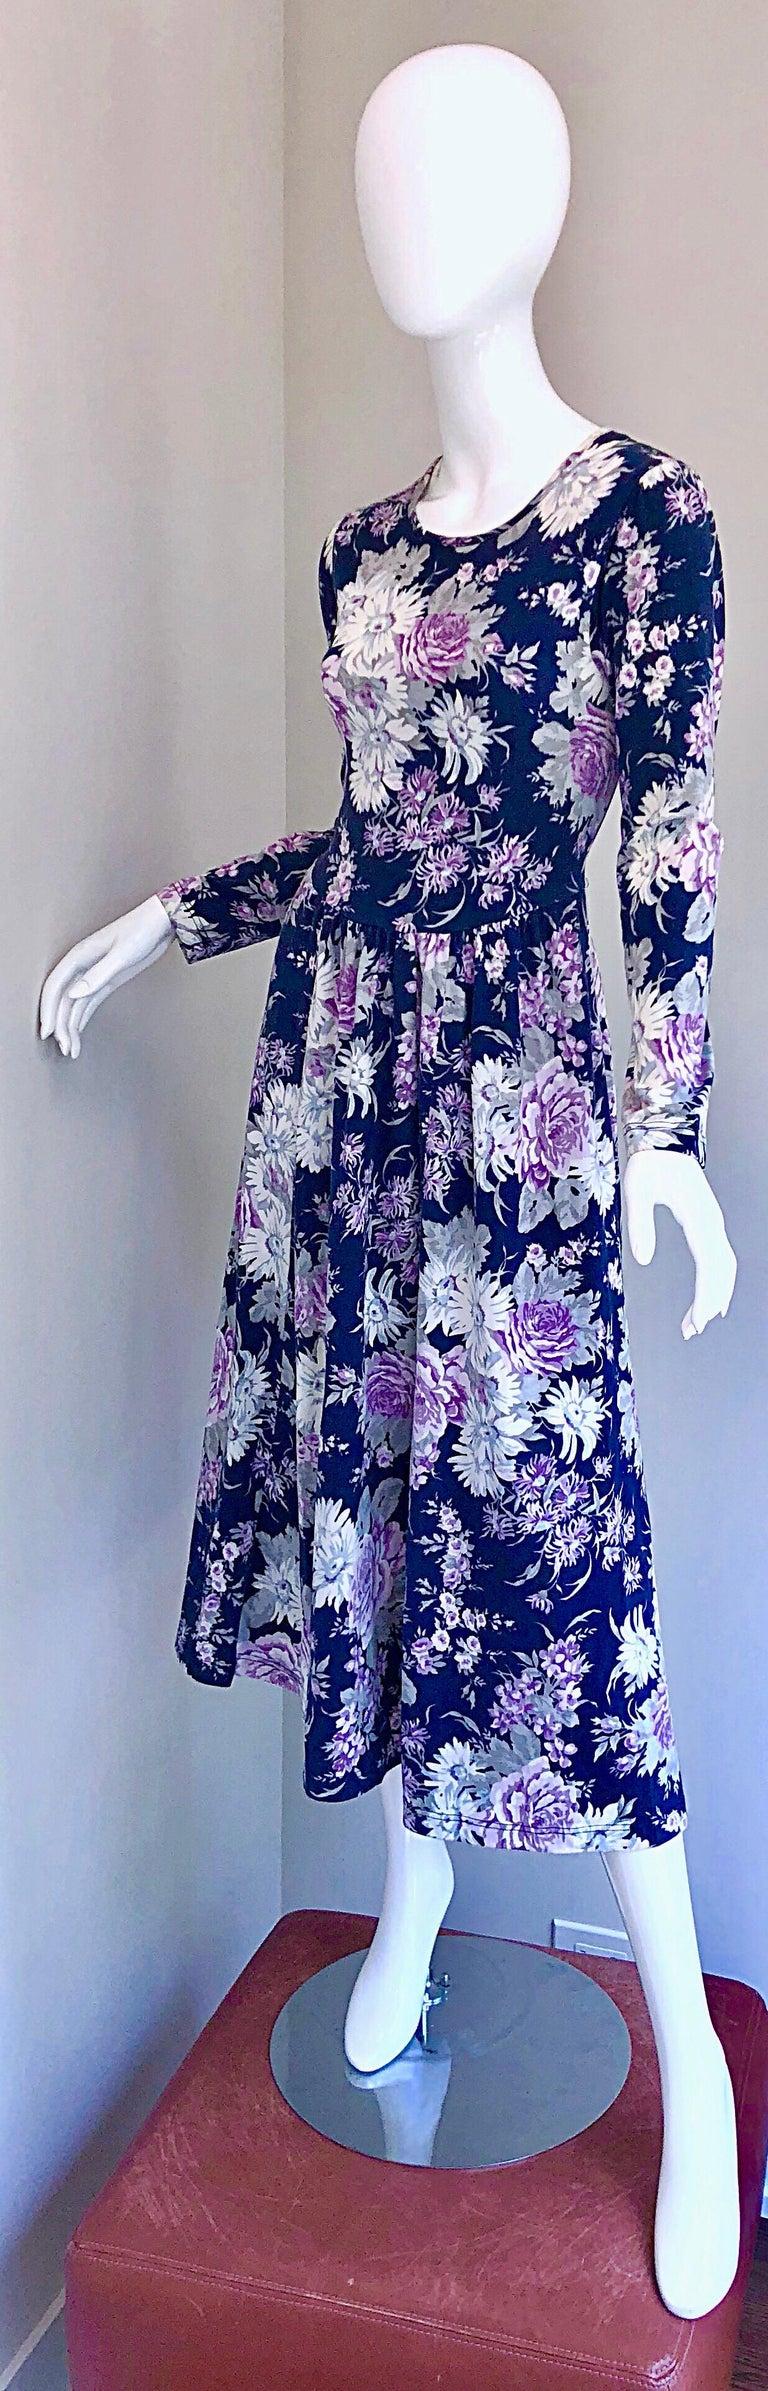 1990s Laura Ashley Navy Blue + Purple Long Sleeve Cotton Vintage 90s Midi Dress For Sale 13